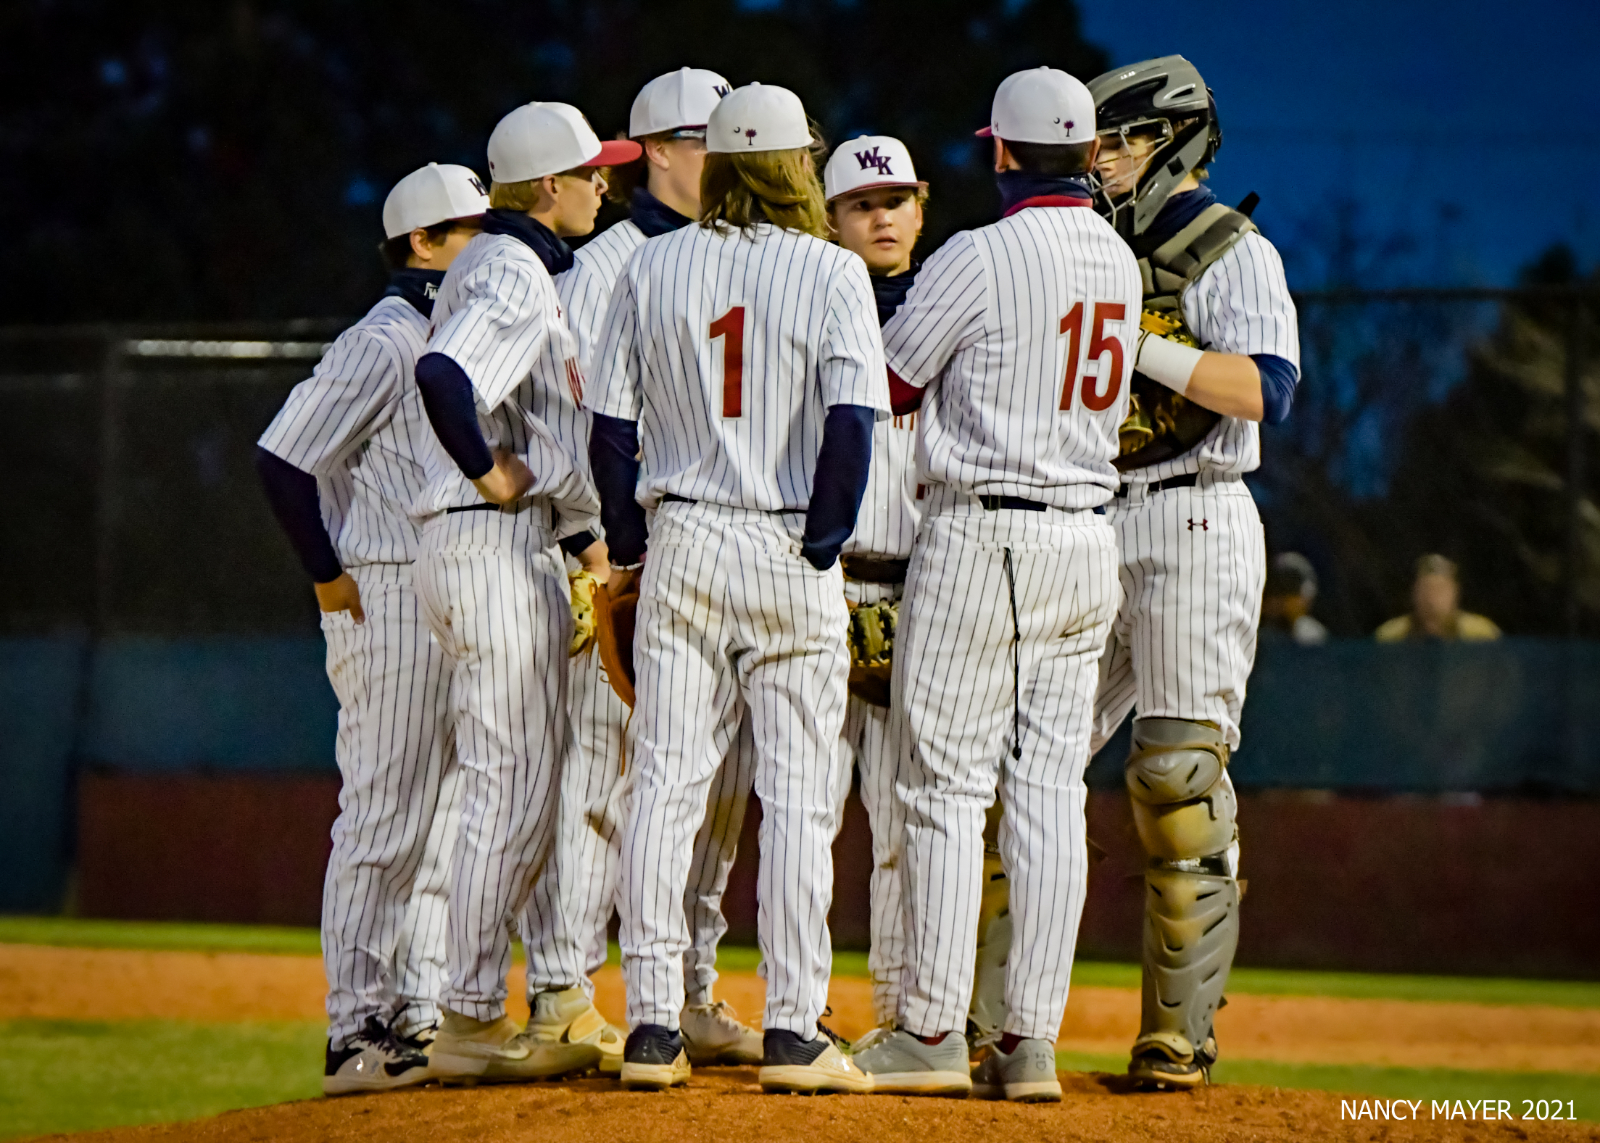 Photos – Varsity Baseball vs Dutch Fork 3/17/2021